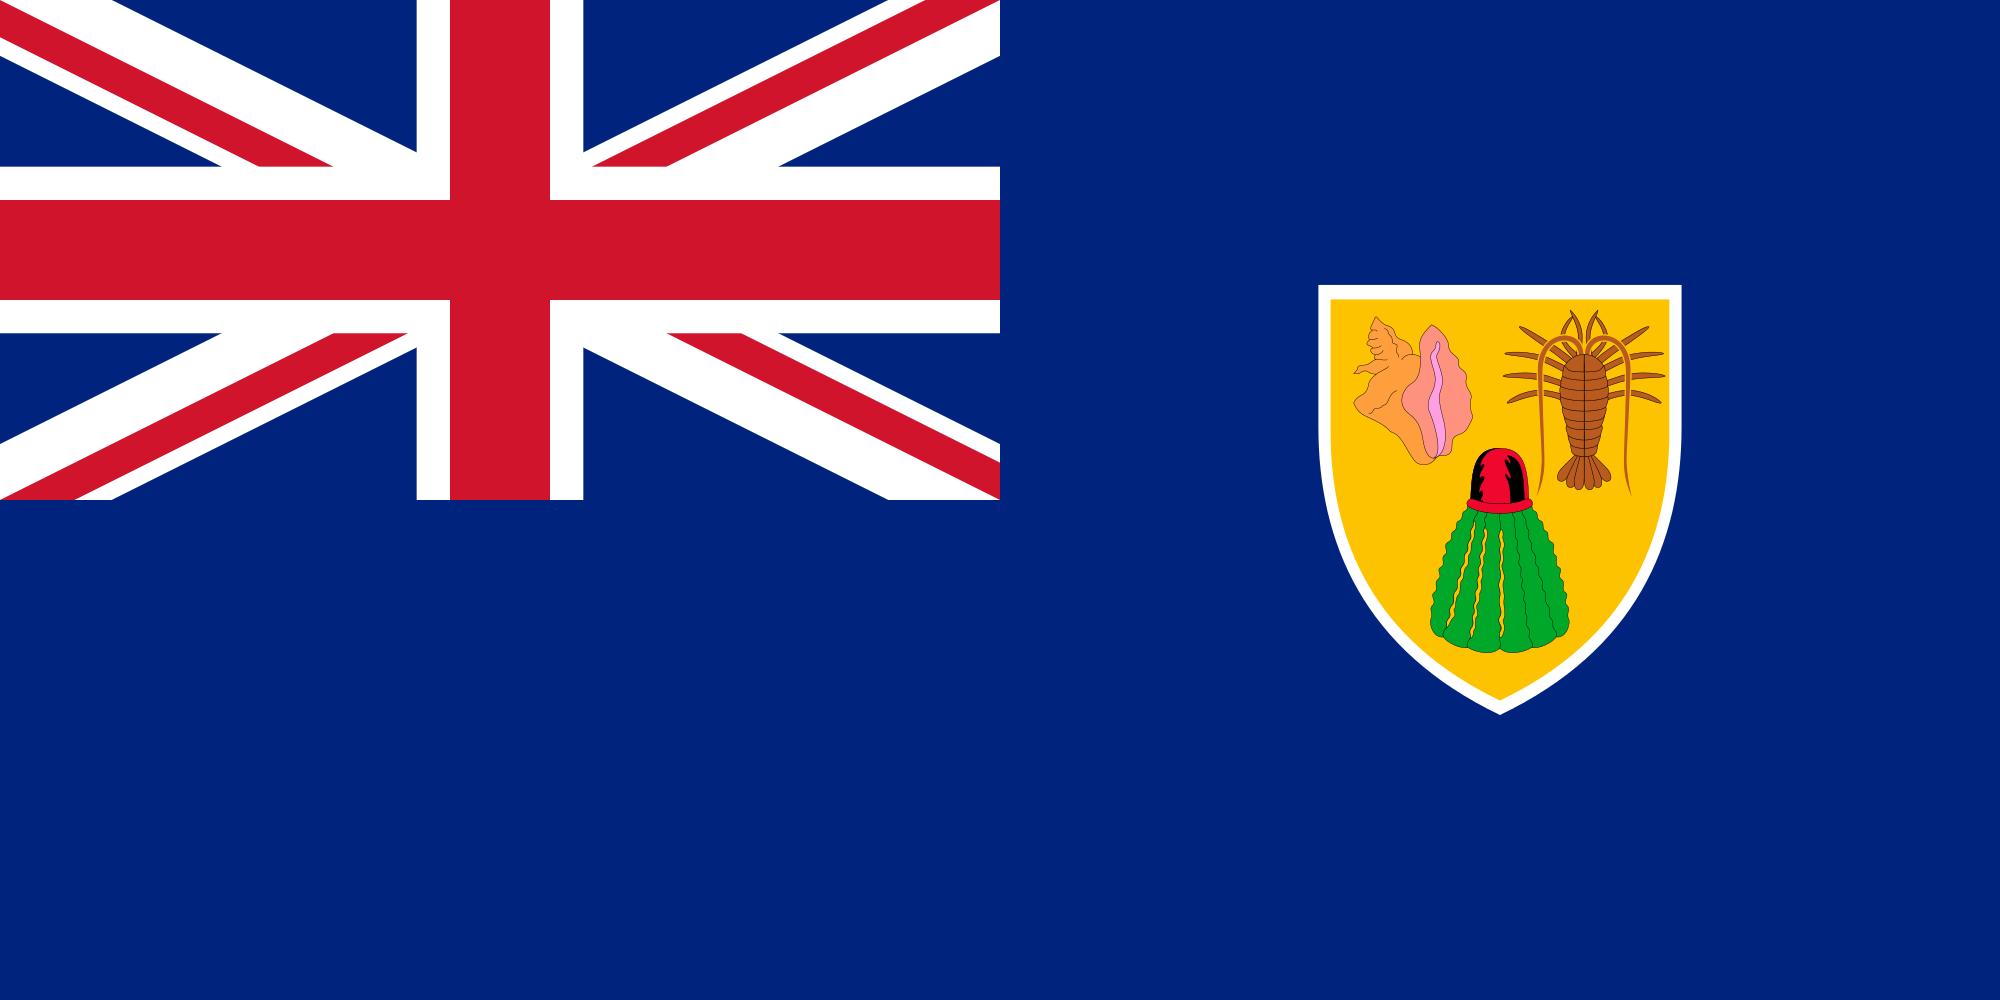 islas turcas y caicos, страна, Эмблема, логотип, символ - Обои HD - Профессор falken.com